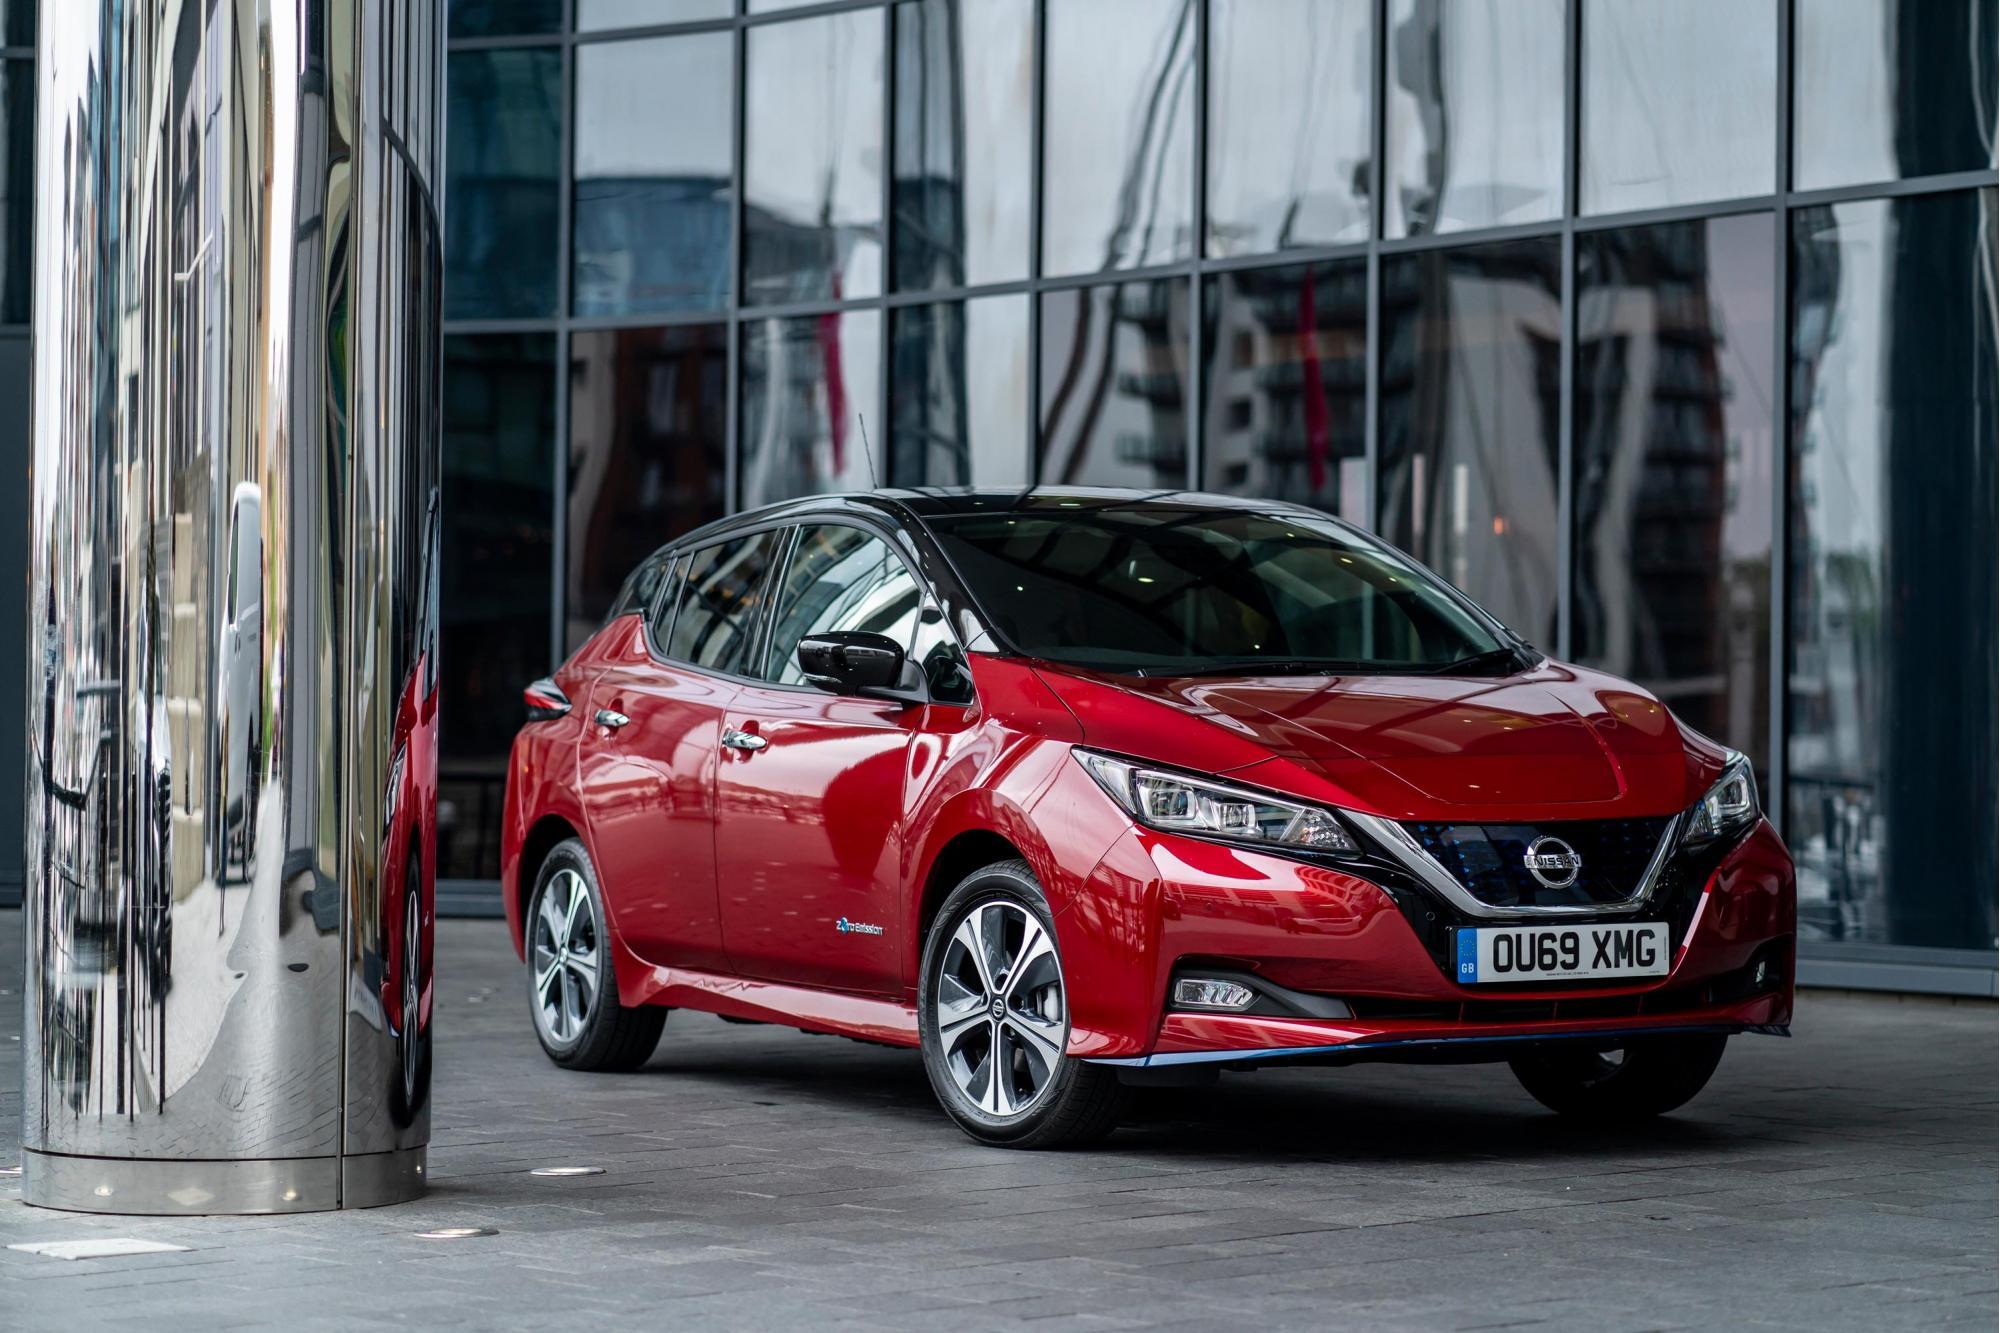 Nissan και Uber προωθούν την κινητικότητα μηδενικών εκπομπών, στο Λονδίνο